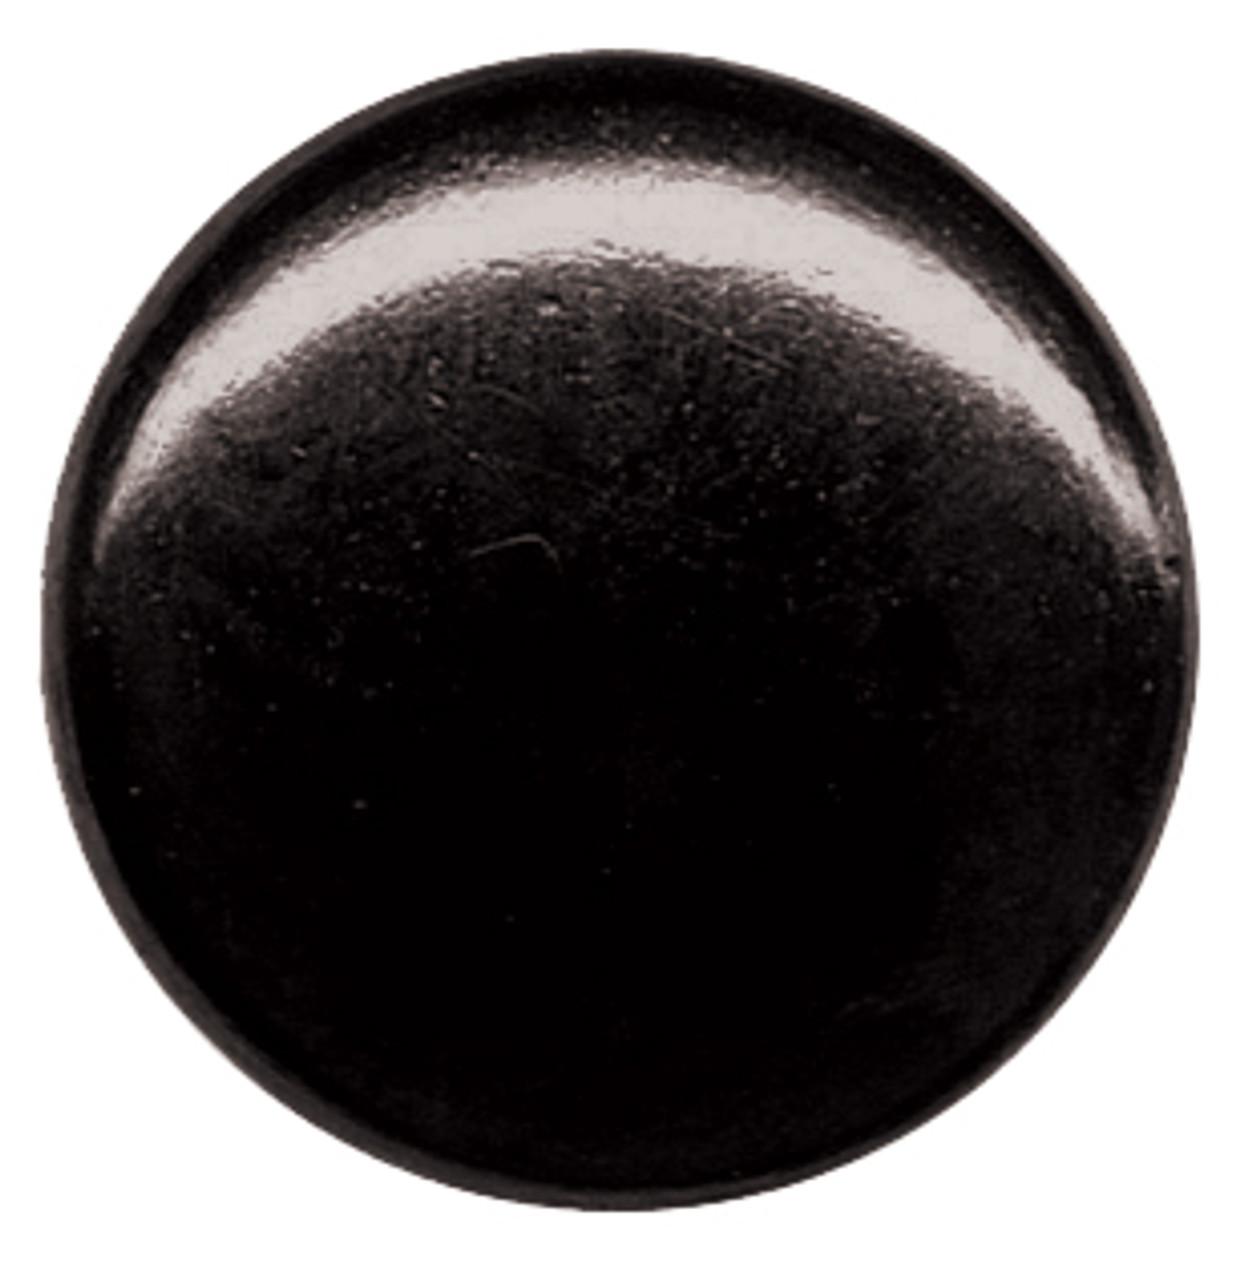 Shiny Black Enamel Finish